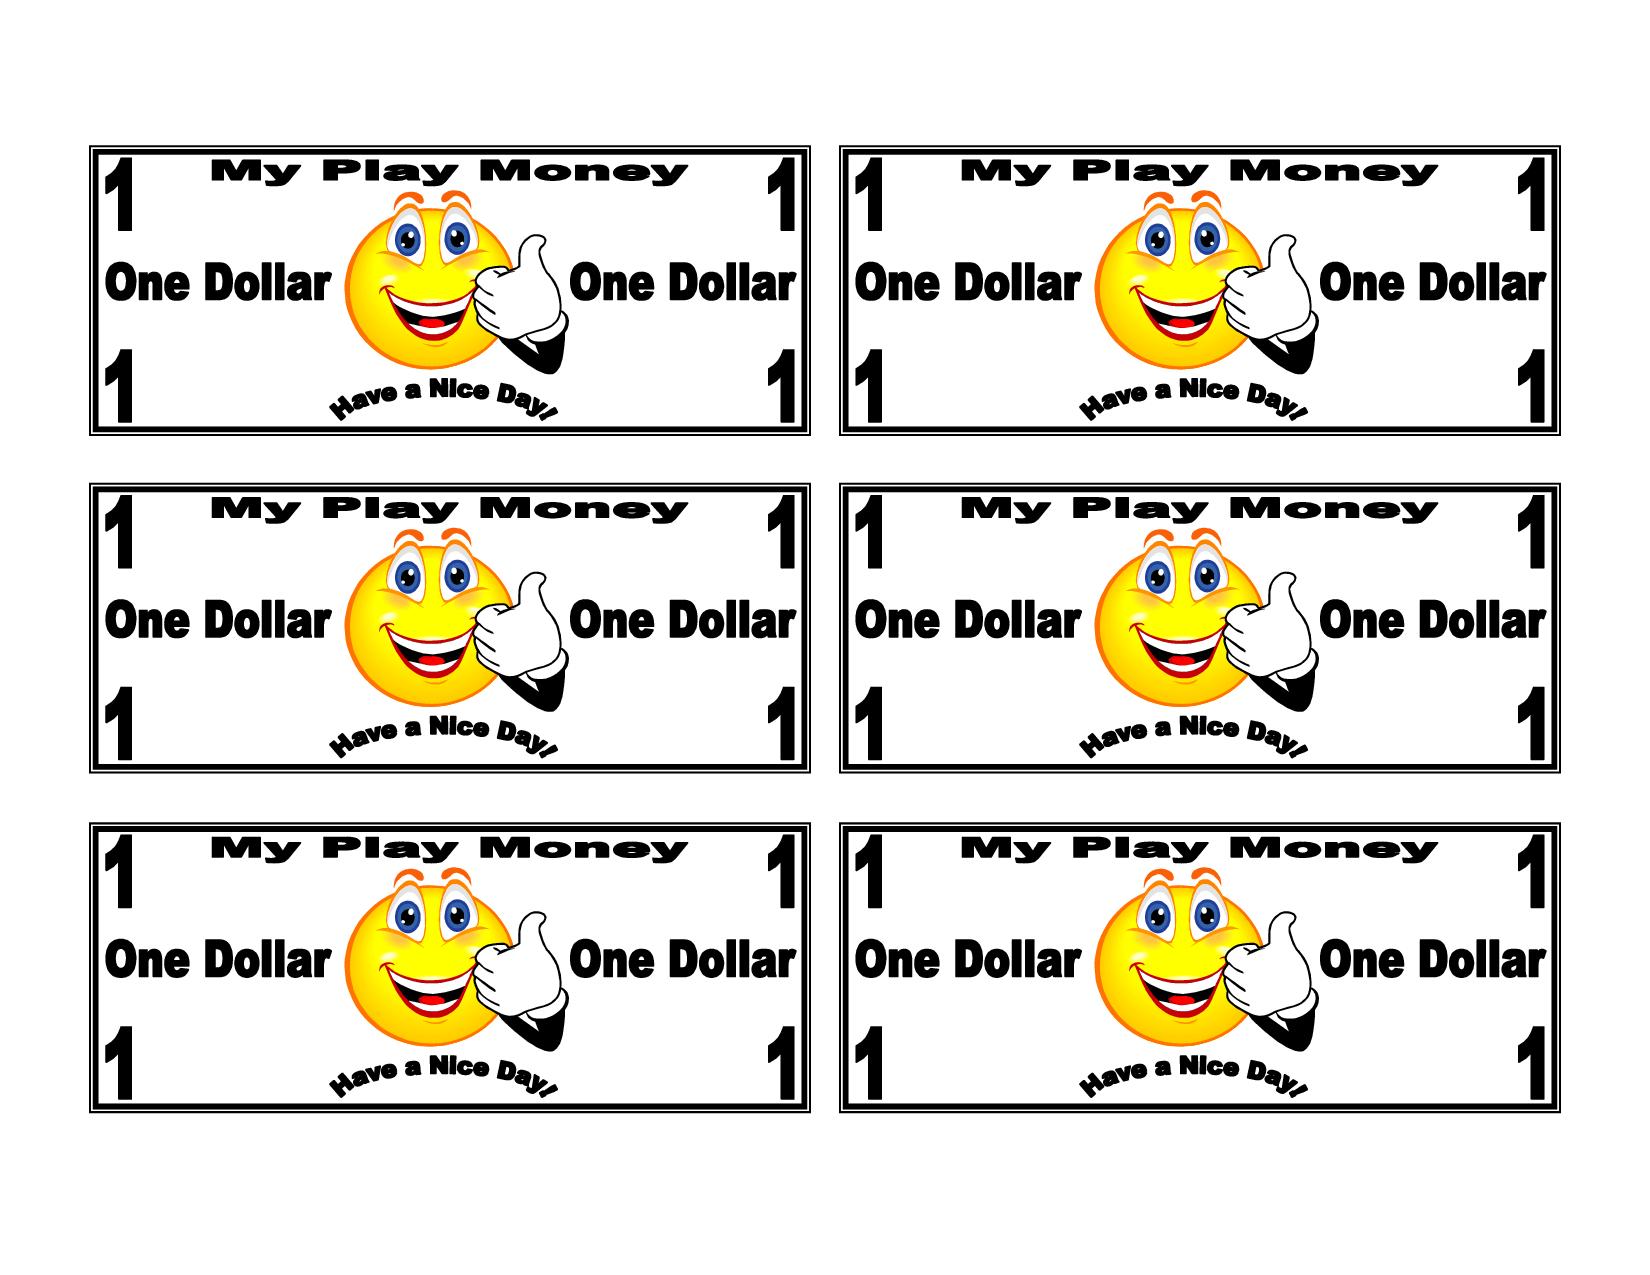 Free Printable Play Money   Printable Money Template Play Money Kids - Free Printable Money For Kids